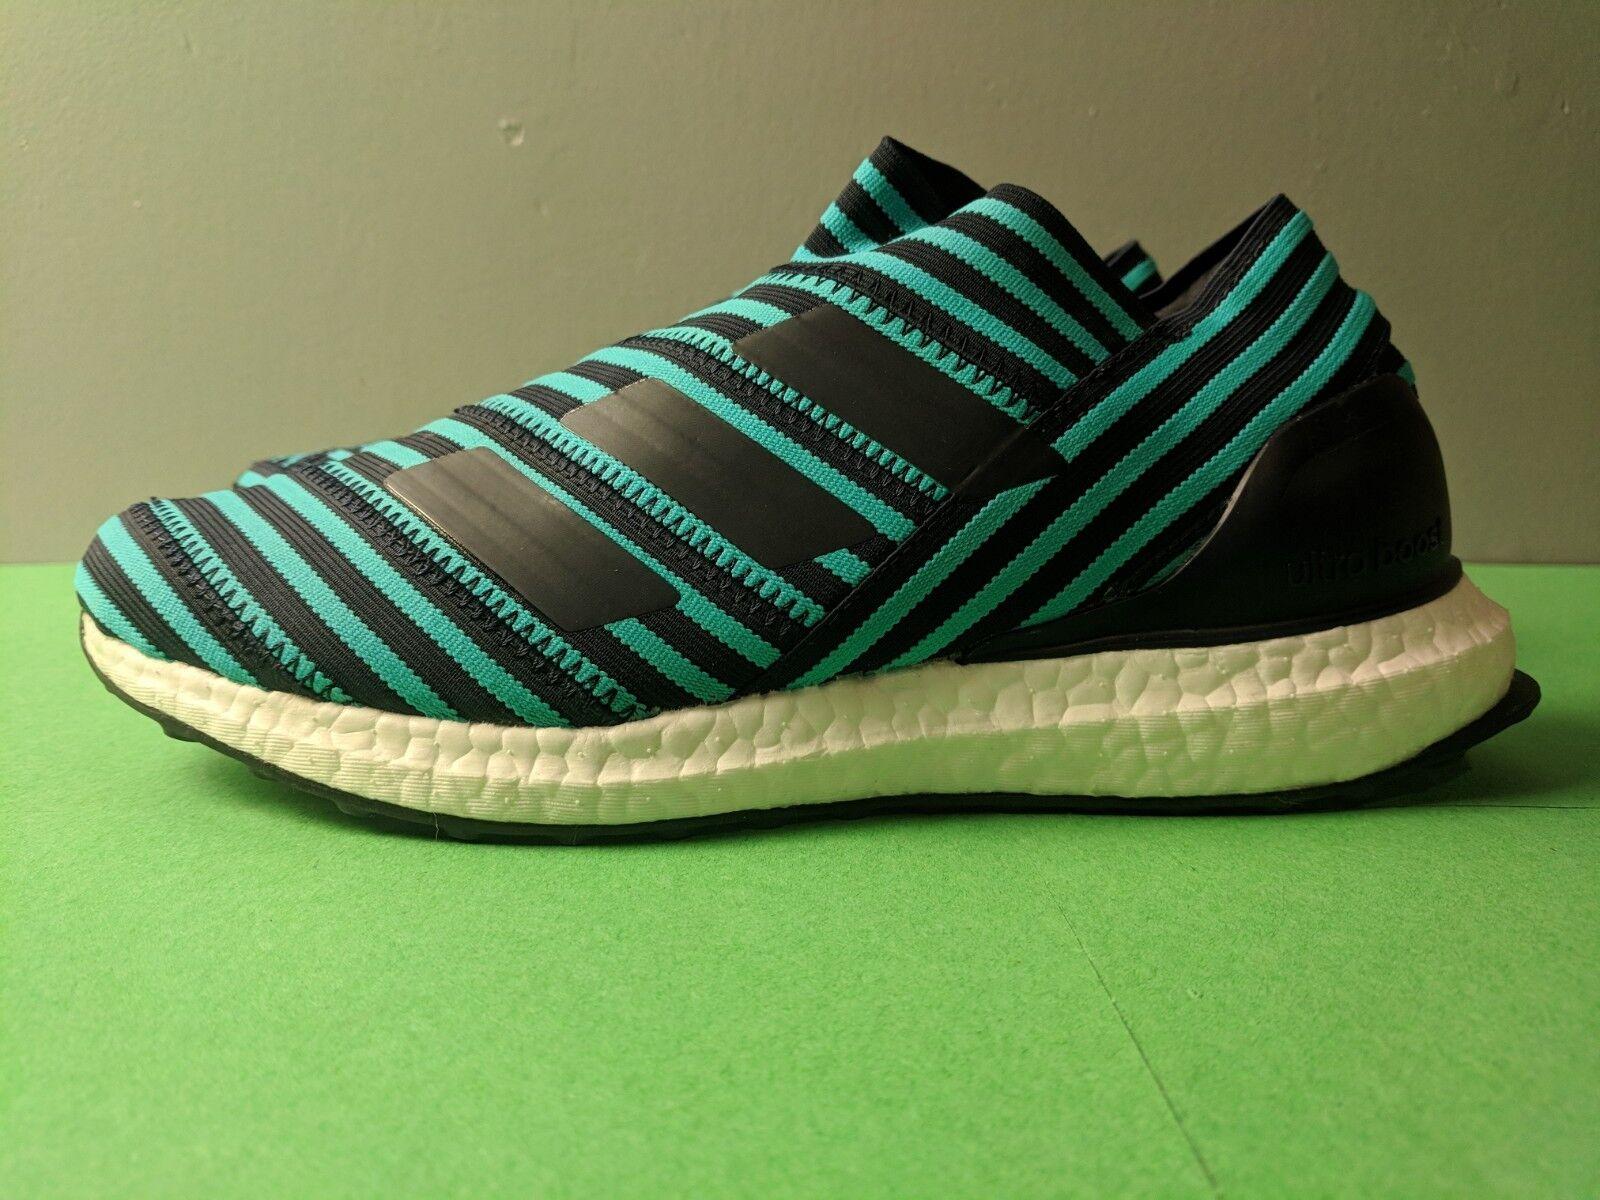 Adidas Nemeziz Tango 17 + 360 Agility CG3658 Soccer Black Aqua Men's Size 7.5